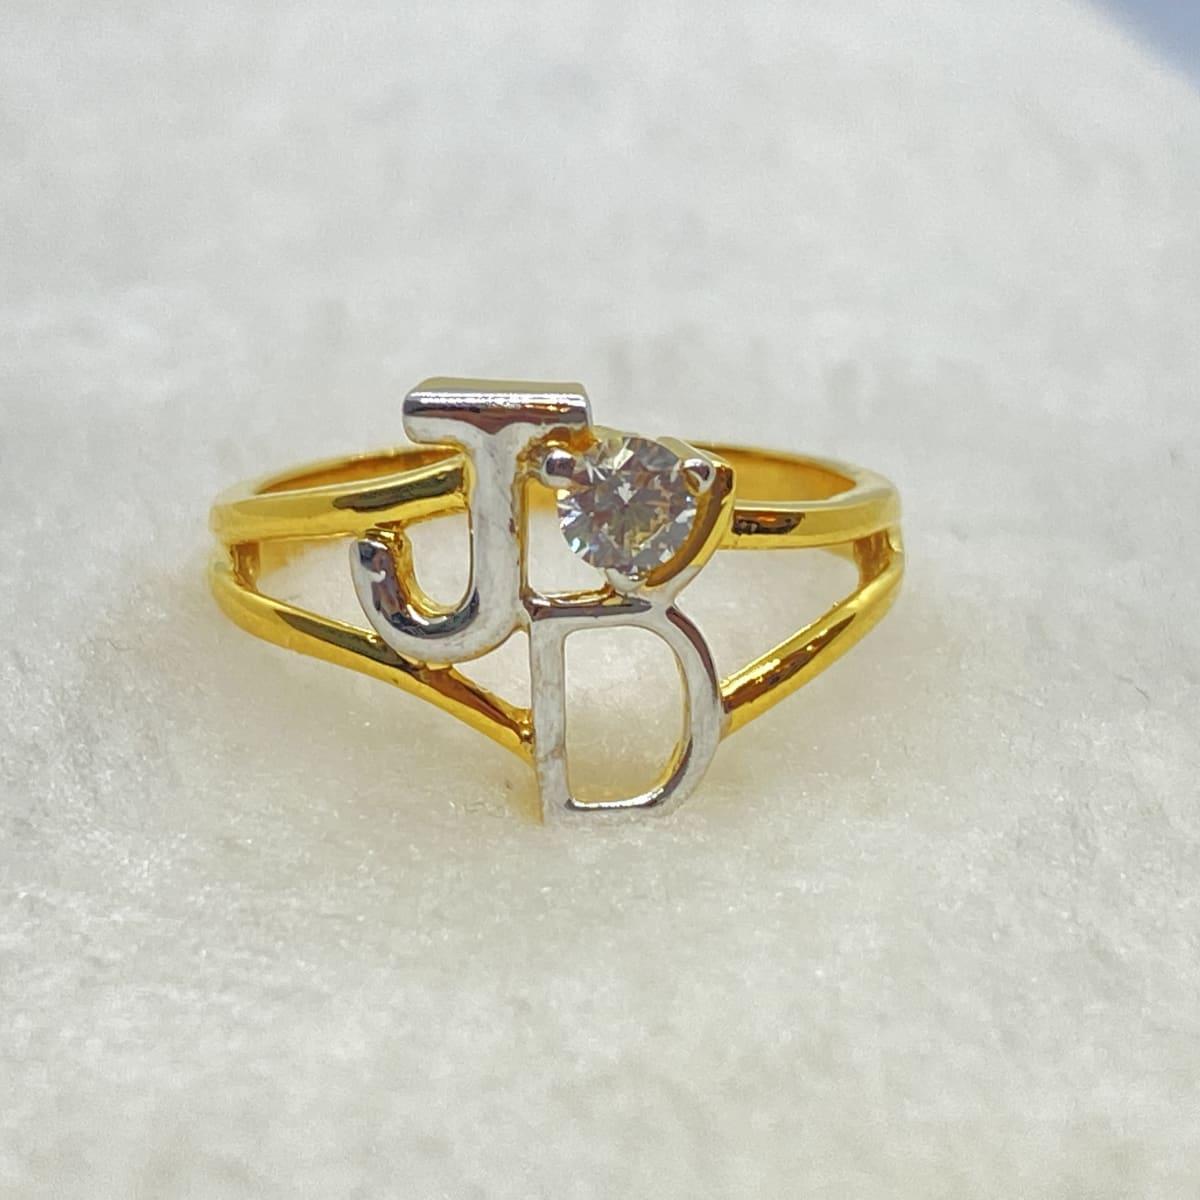 Fancy Initial Engagement Ring Gj0057